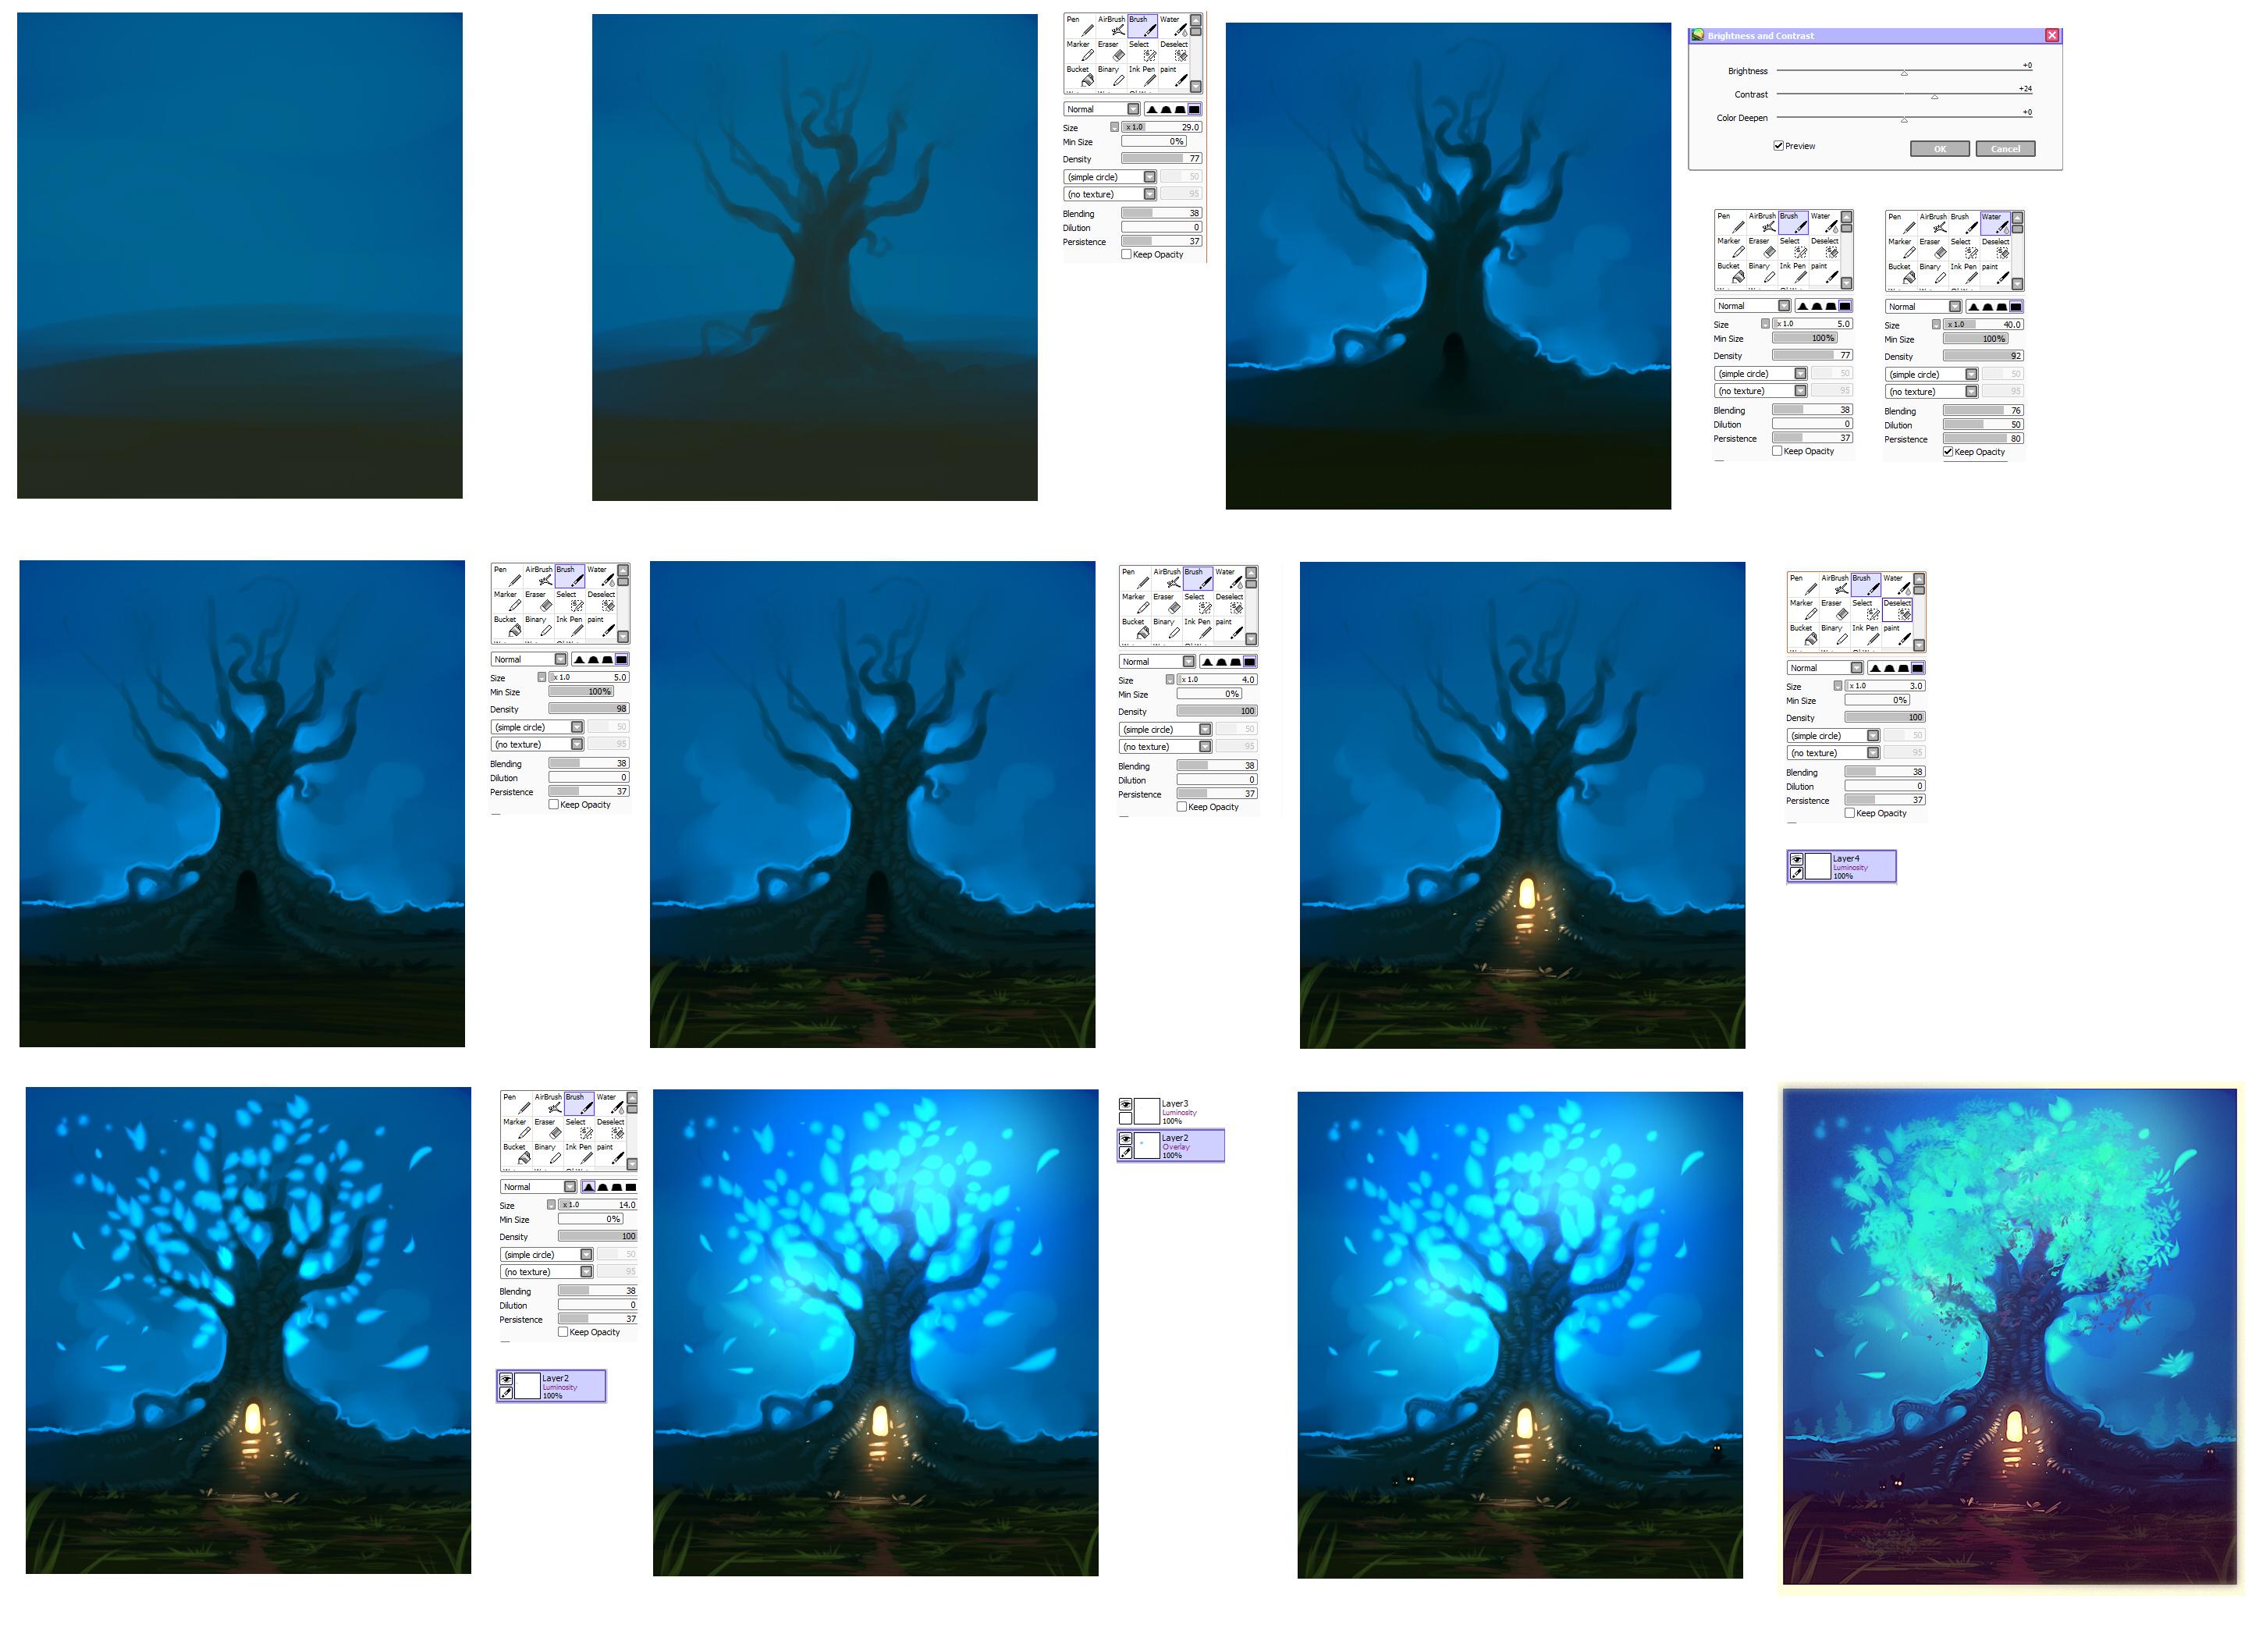 Magic Tree step by step - tutorial by ryky